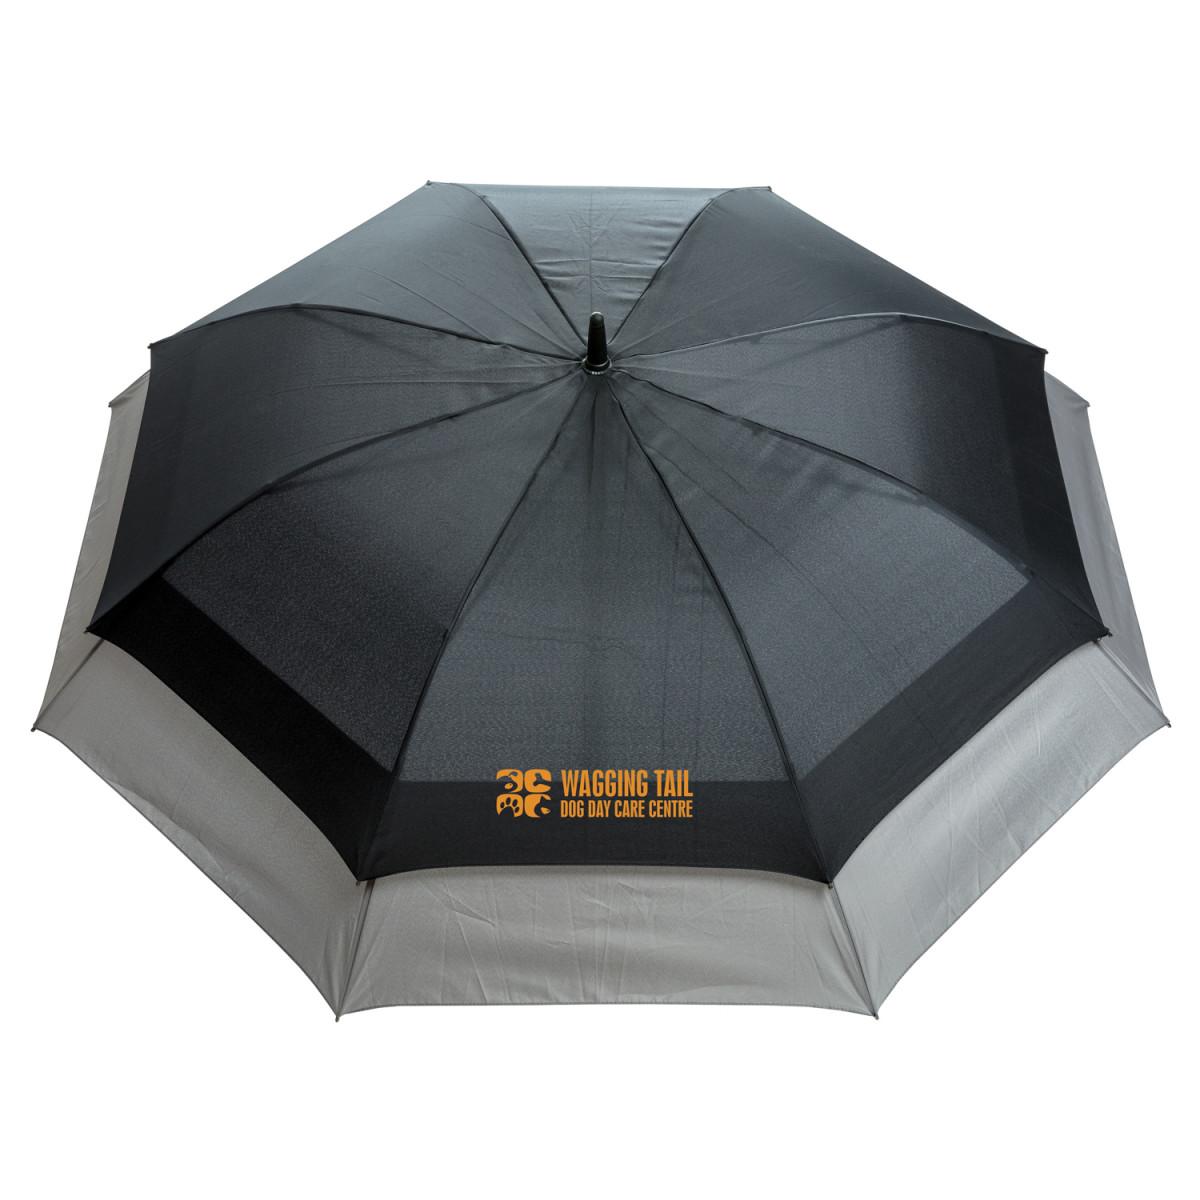 Расширяющийся зонт-антишторм Swiss Peak 23 - 27,черный